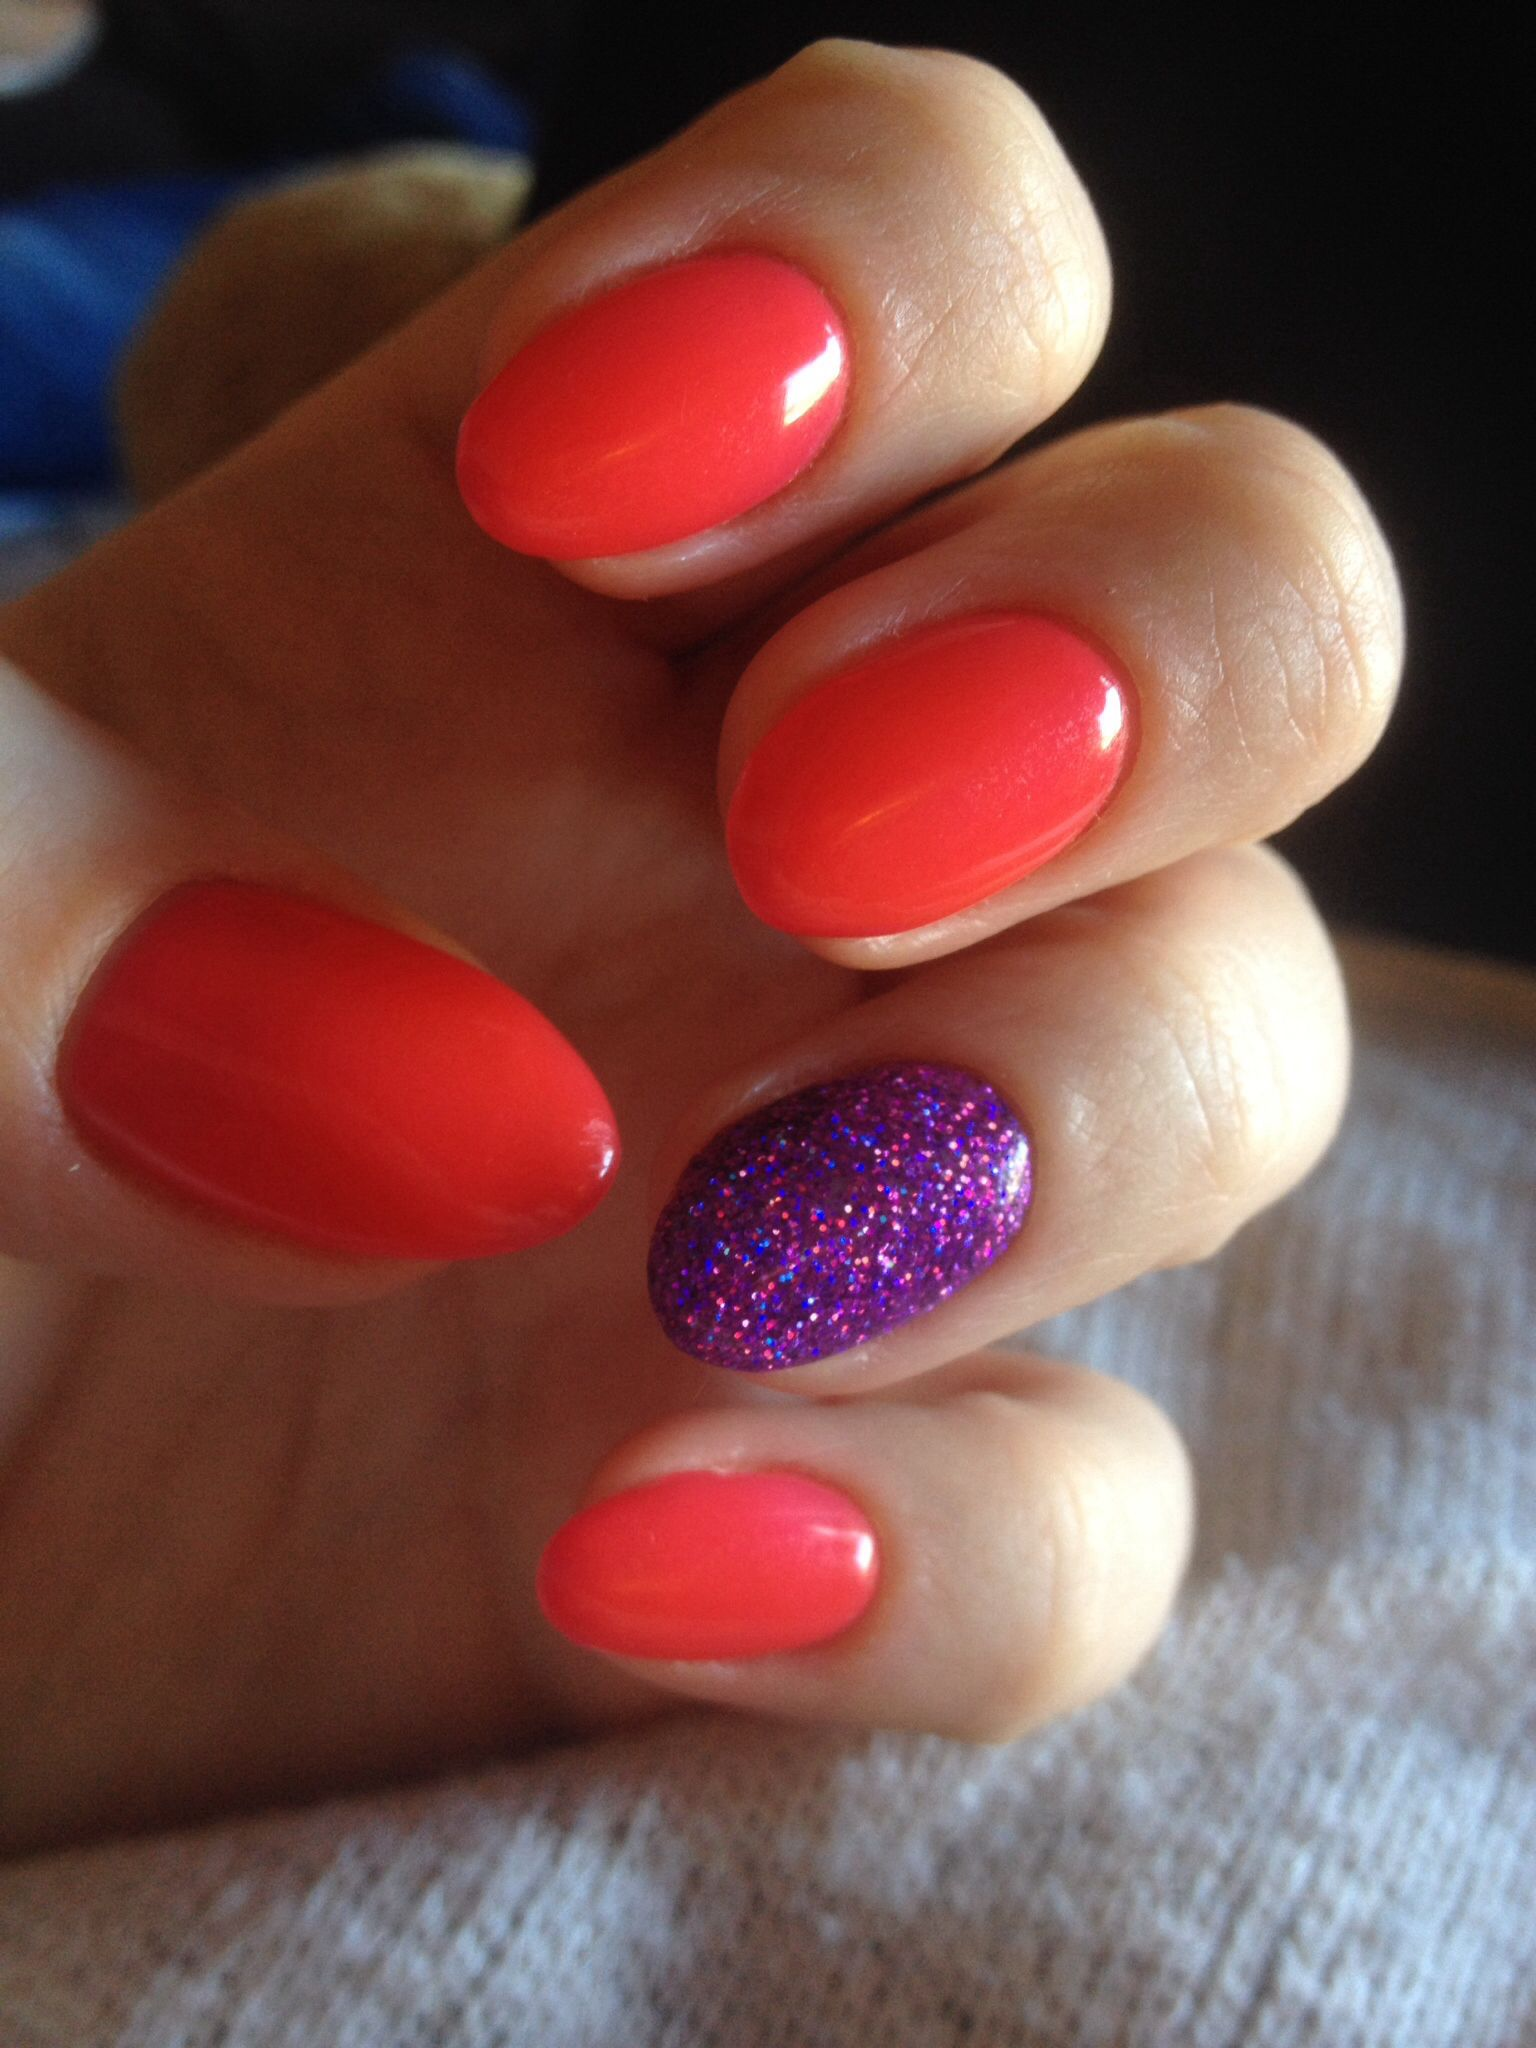 Bio Sculpture No 101 With Purple Glitter Nail Art Nails